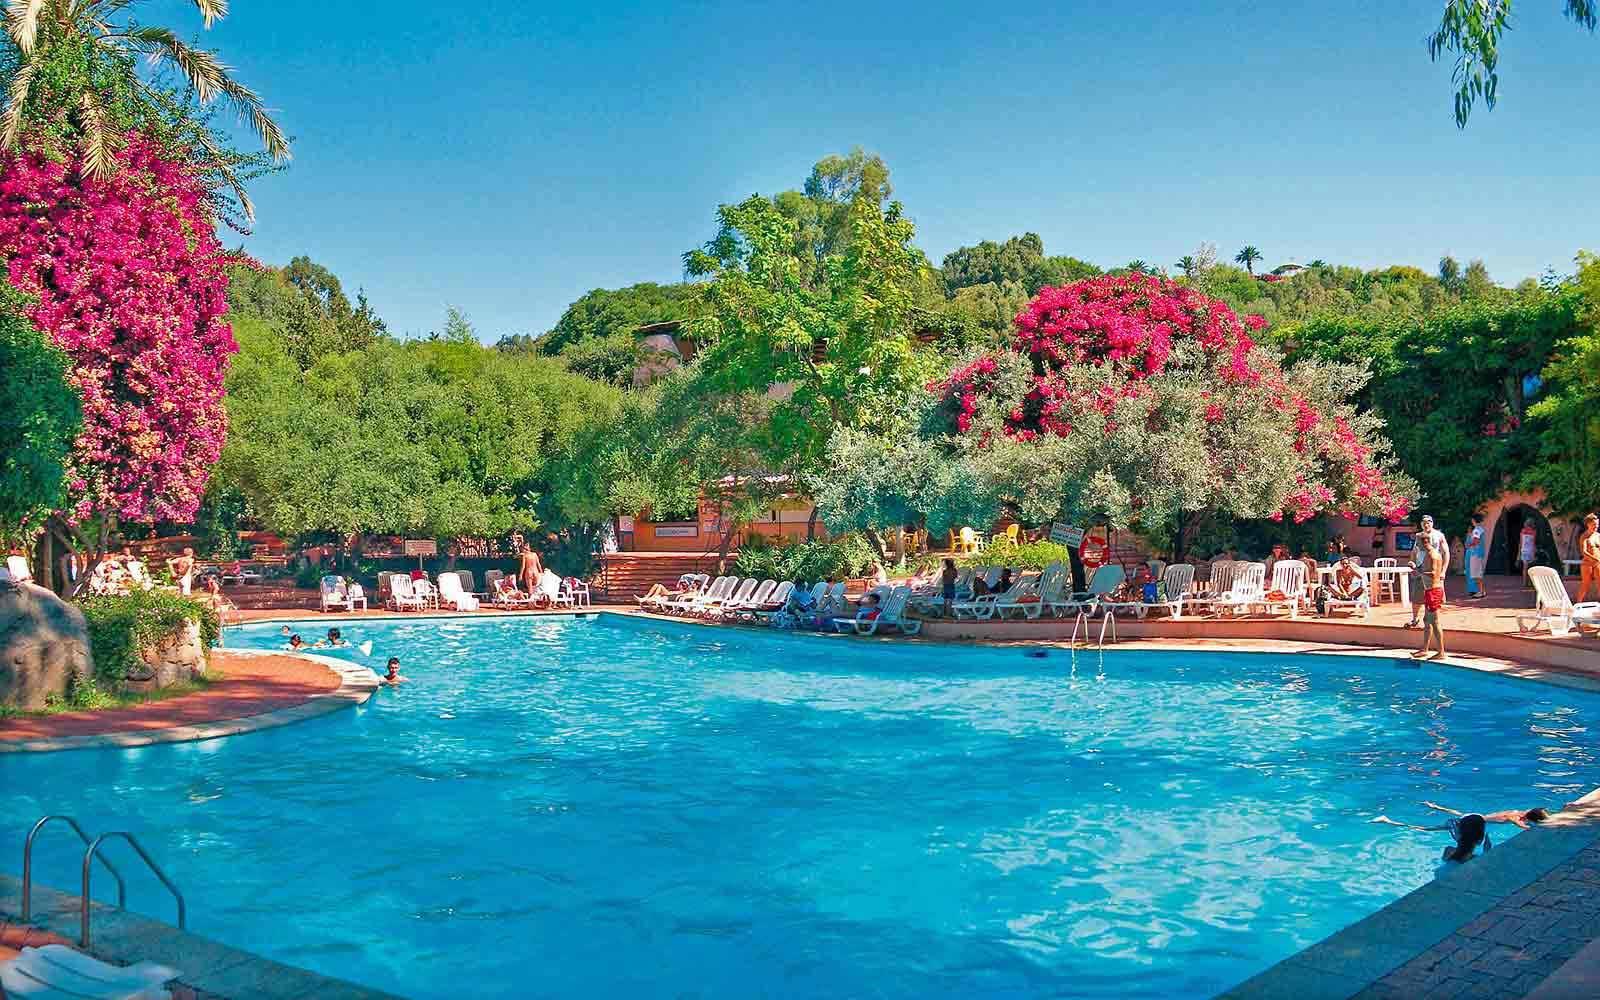 Central Pool at Arbatax Park Resort - Telis